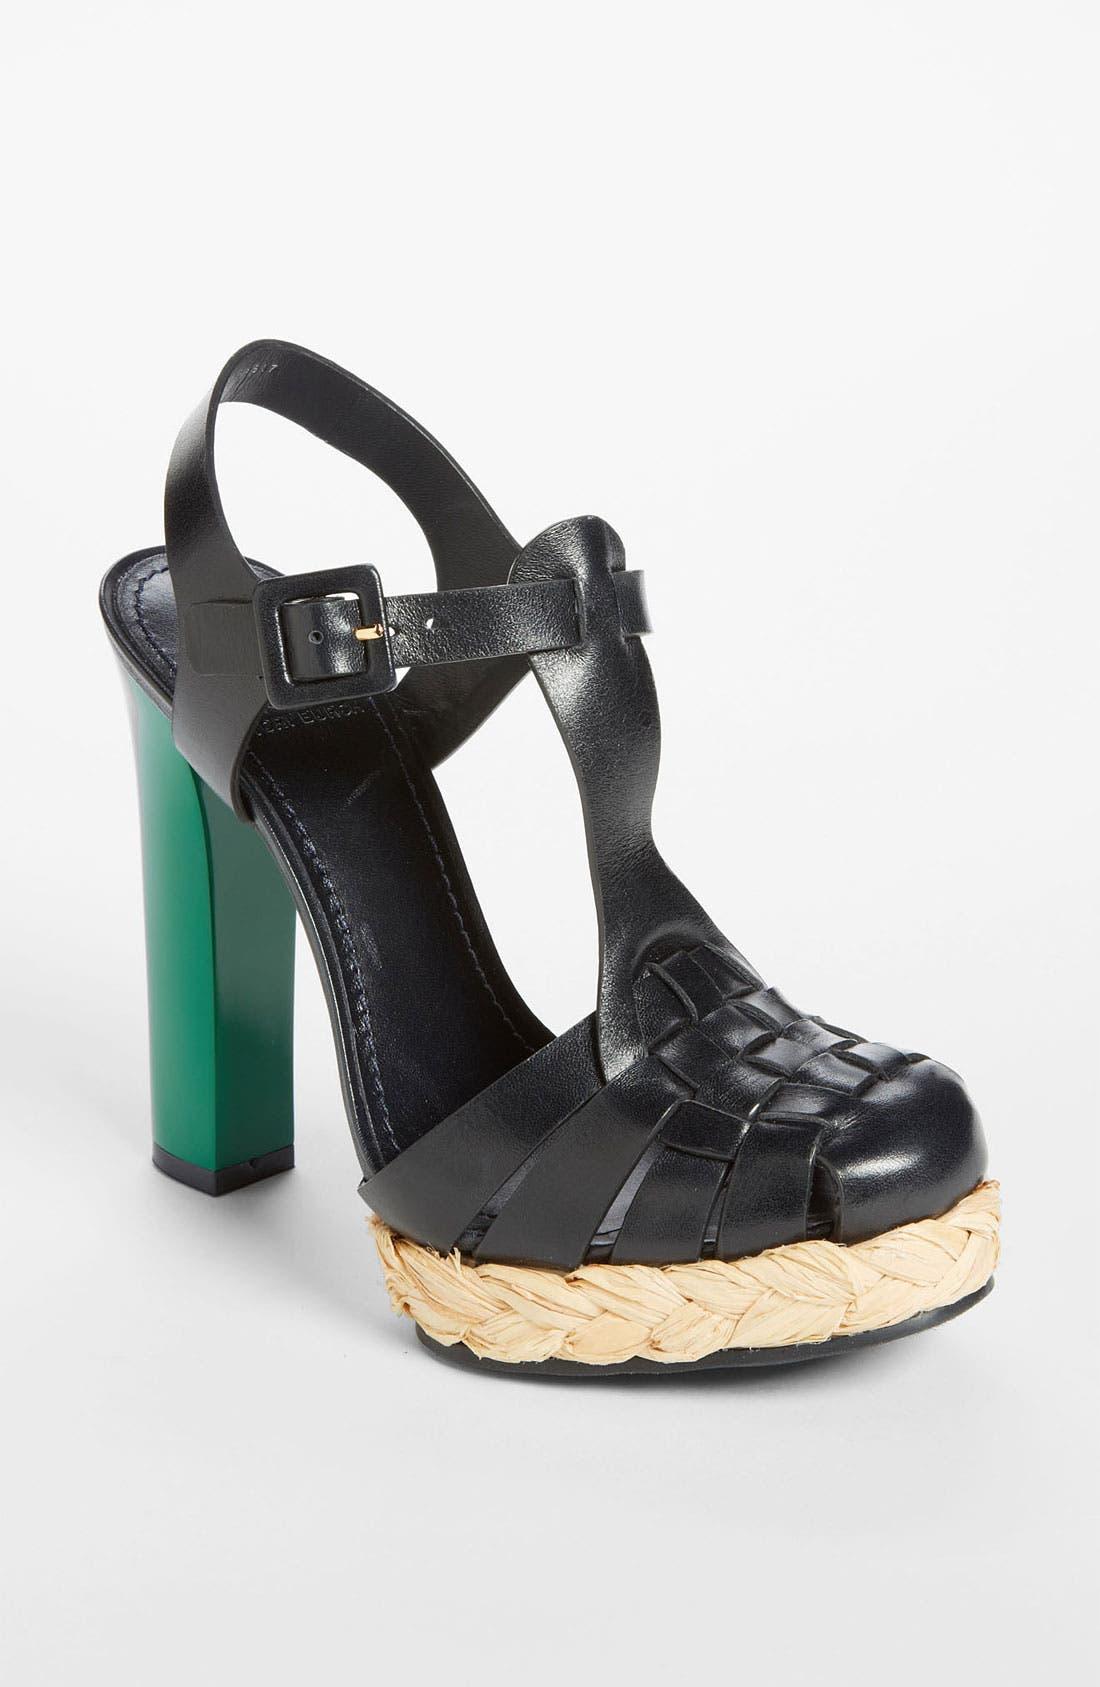 Alternate Image 1 Selected - Tory Burch 'Abella' Sandal